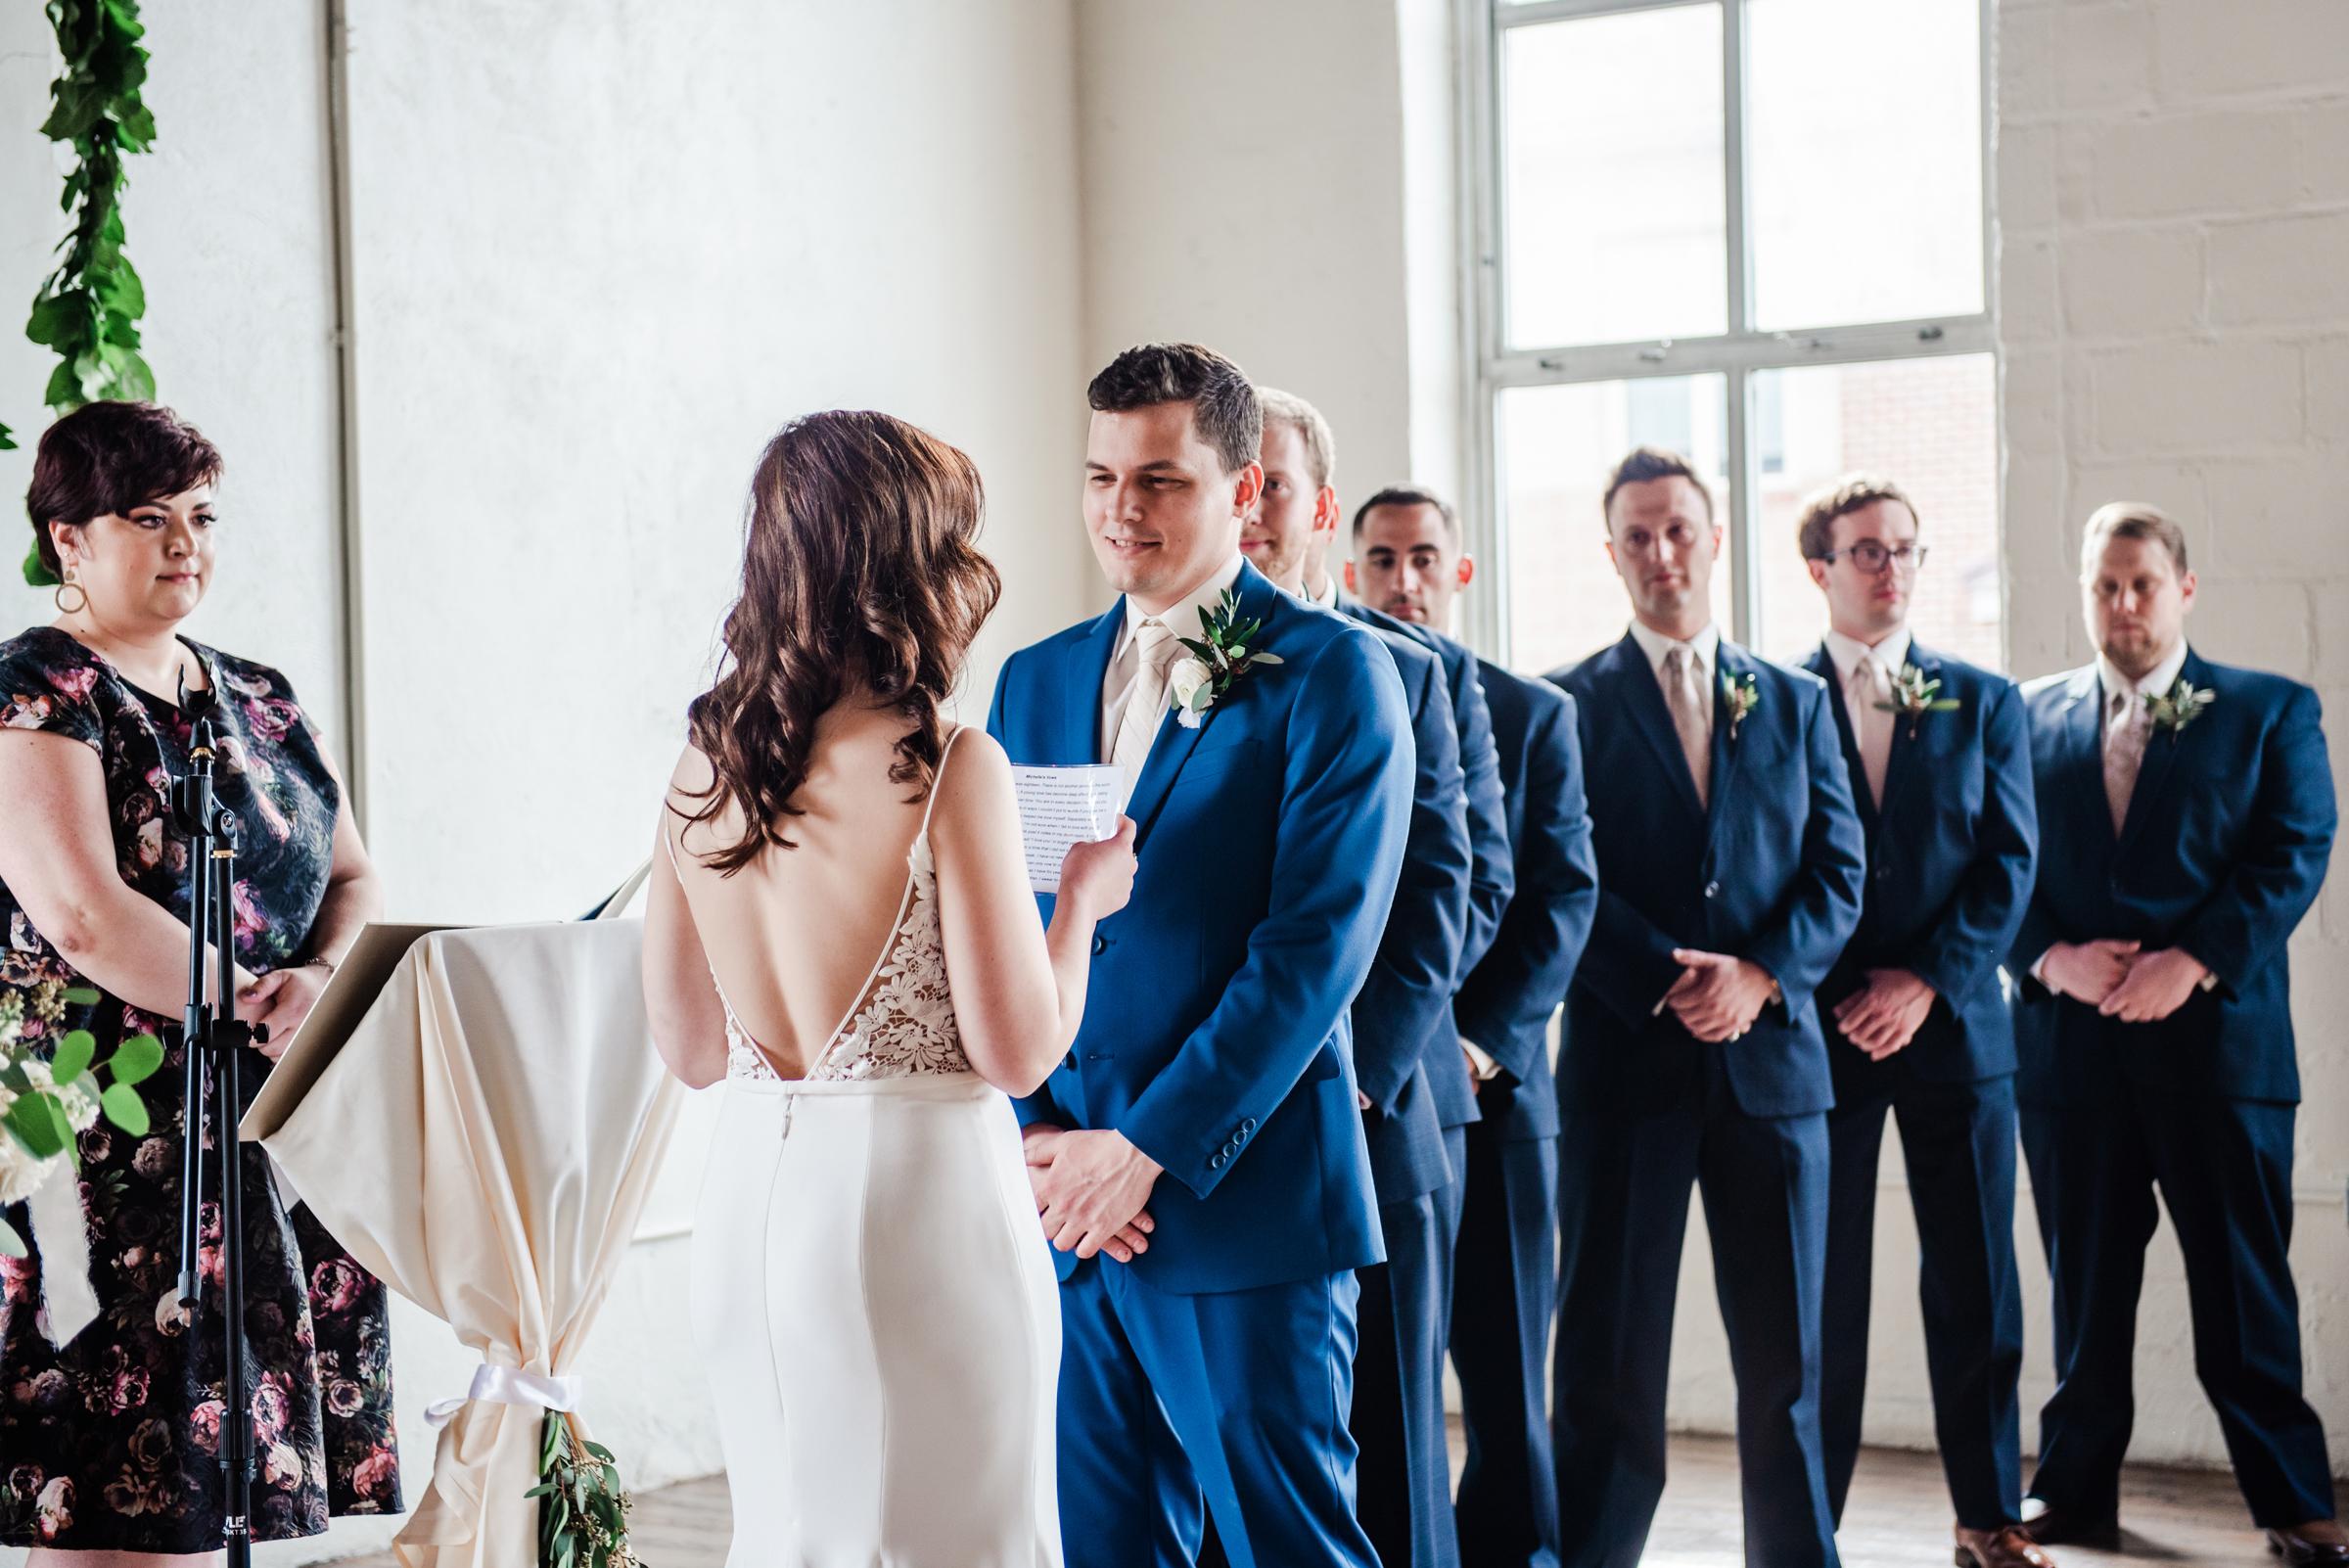 The_Arbor_LoftRochester_Wedding_JILL_STUDIO_Rochester_NY_Photographer_171020.jpg